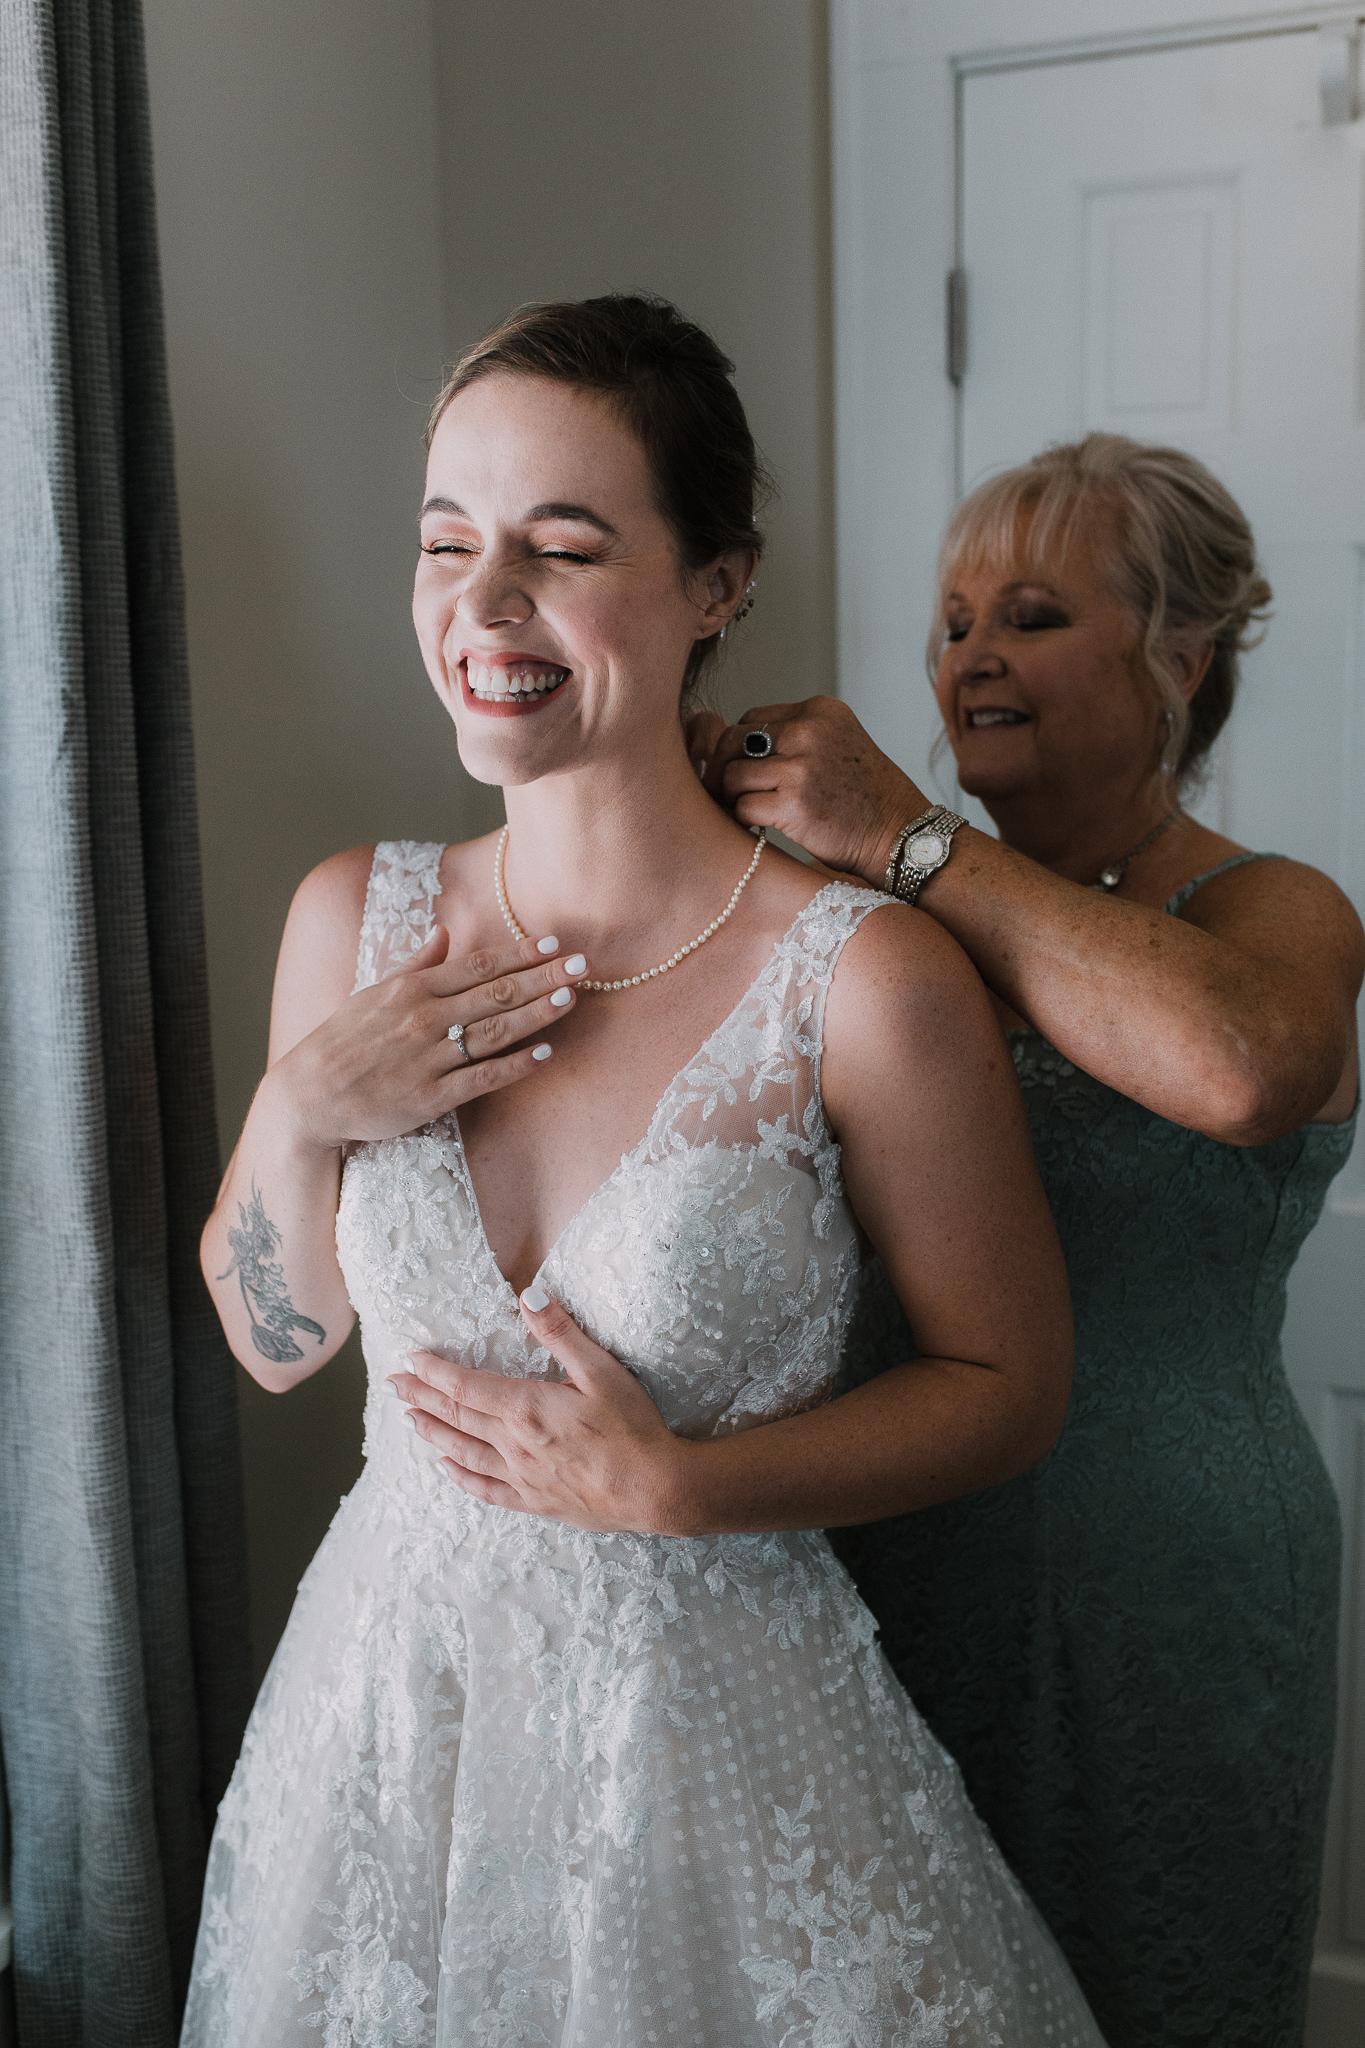 sheffwedding-44.JPG